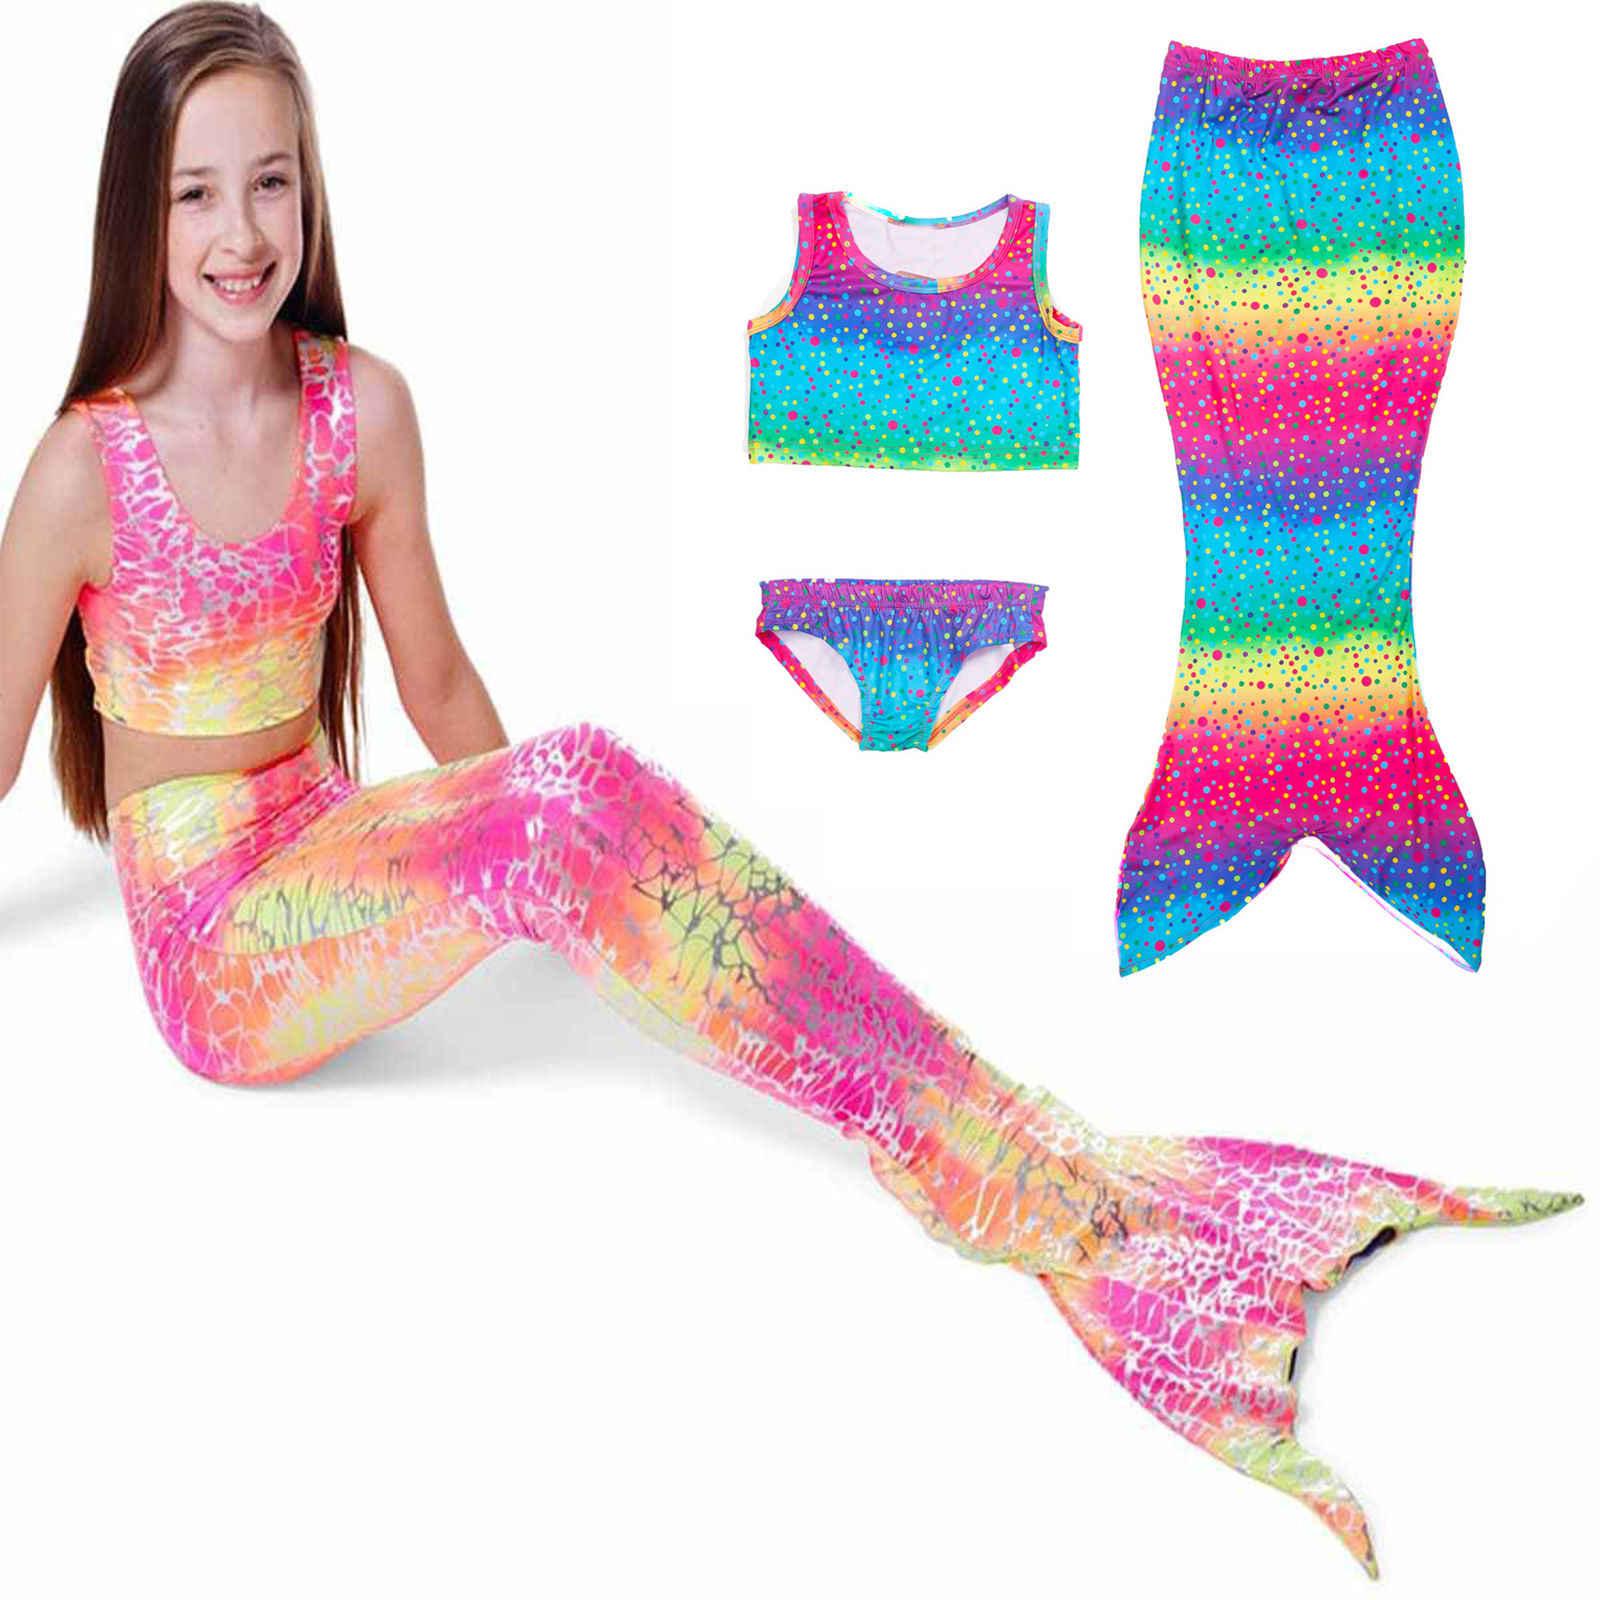 c545f490368 Kids Mermaid Cosplay Swimming Suit Little Mermaid Tails Children swimming  mermaid tail Bikini Dress Skirt Hot